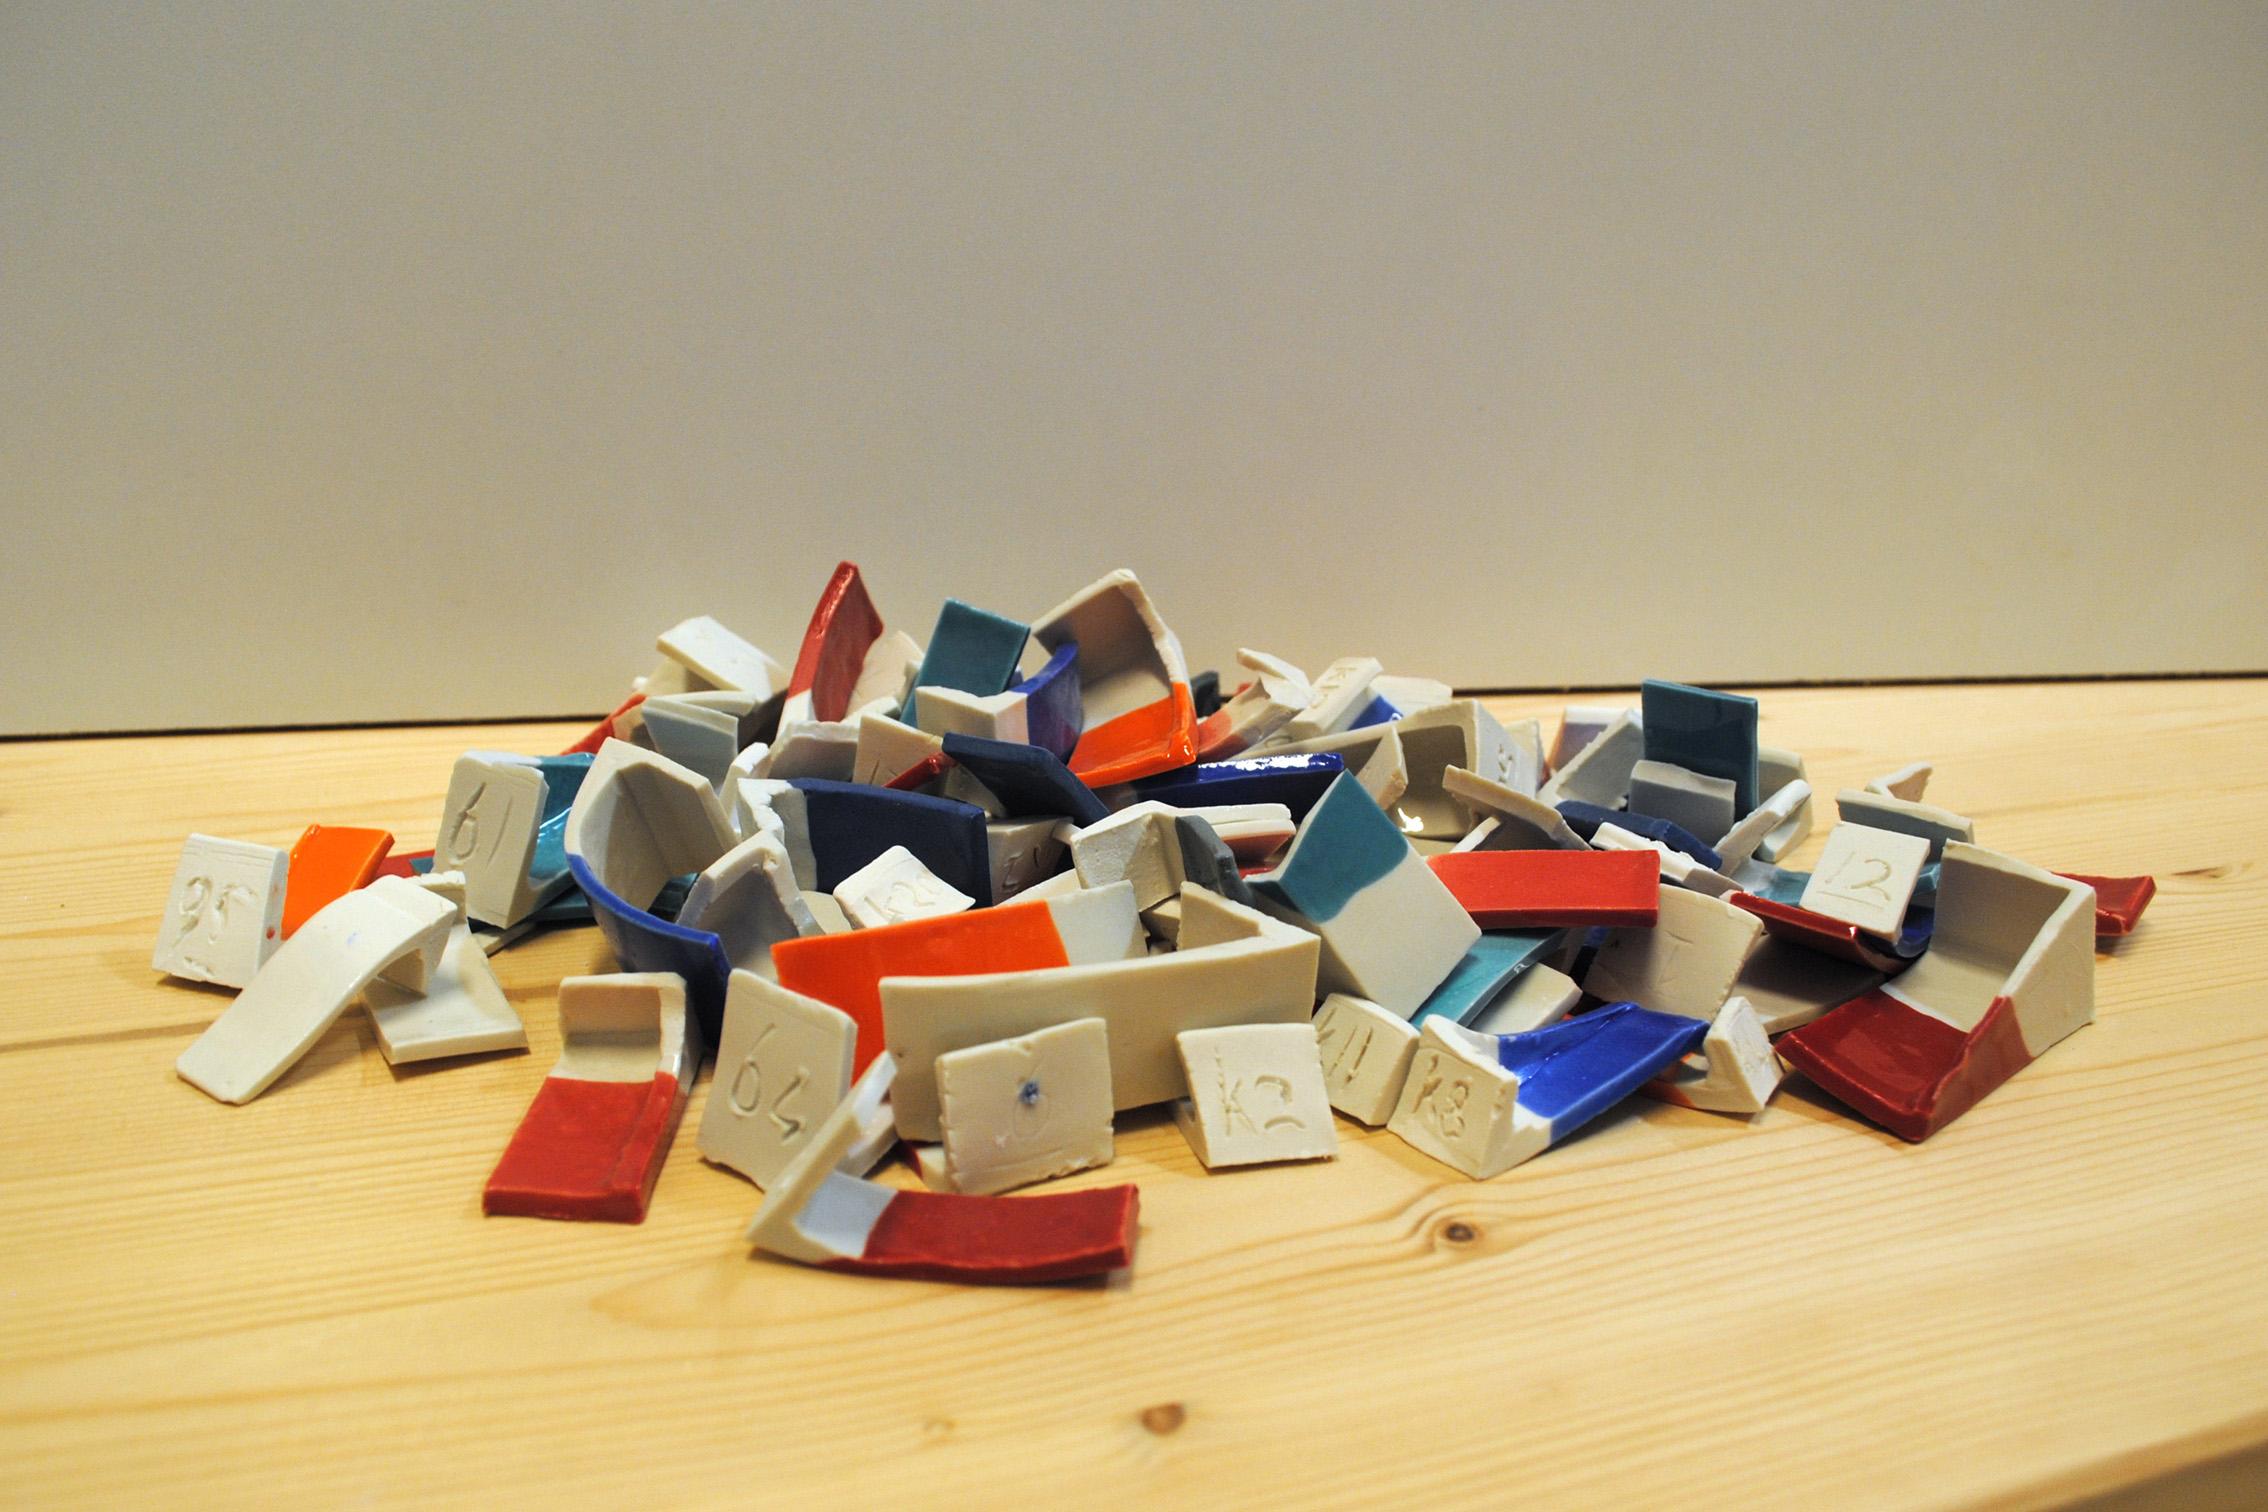 a13_mdba_mdby_manufactured_ceramics_design_studio_lorier_ production